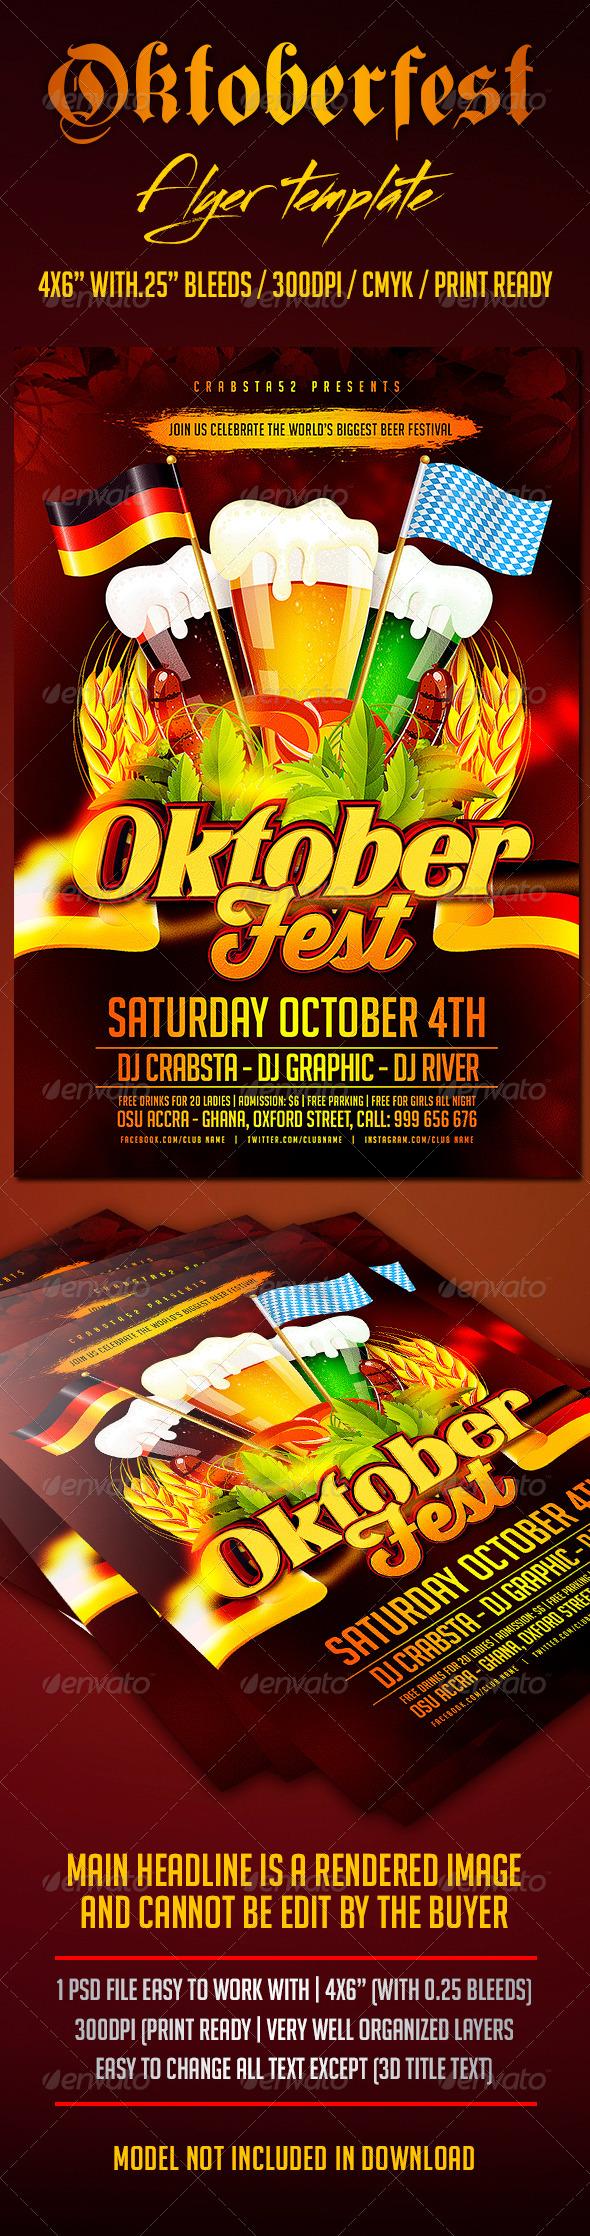 GraphicRiver Oktoberfest Flyer Template 8713903